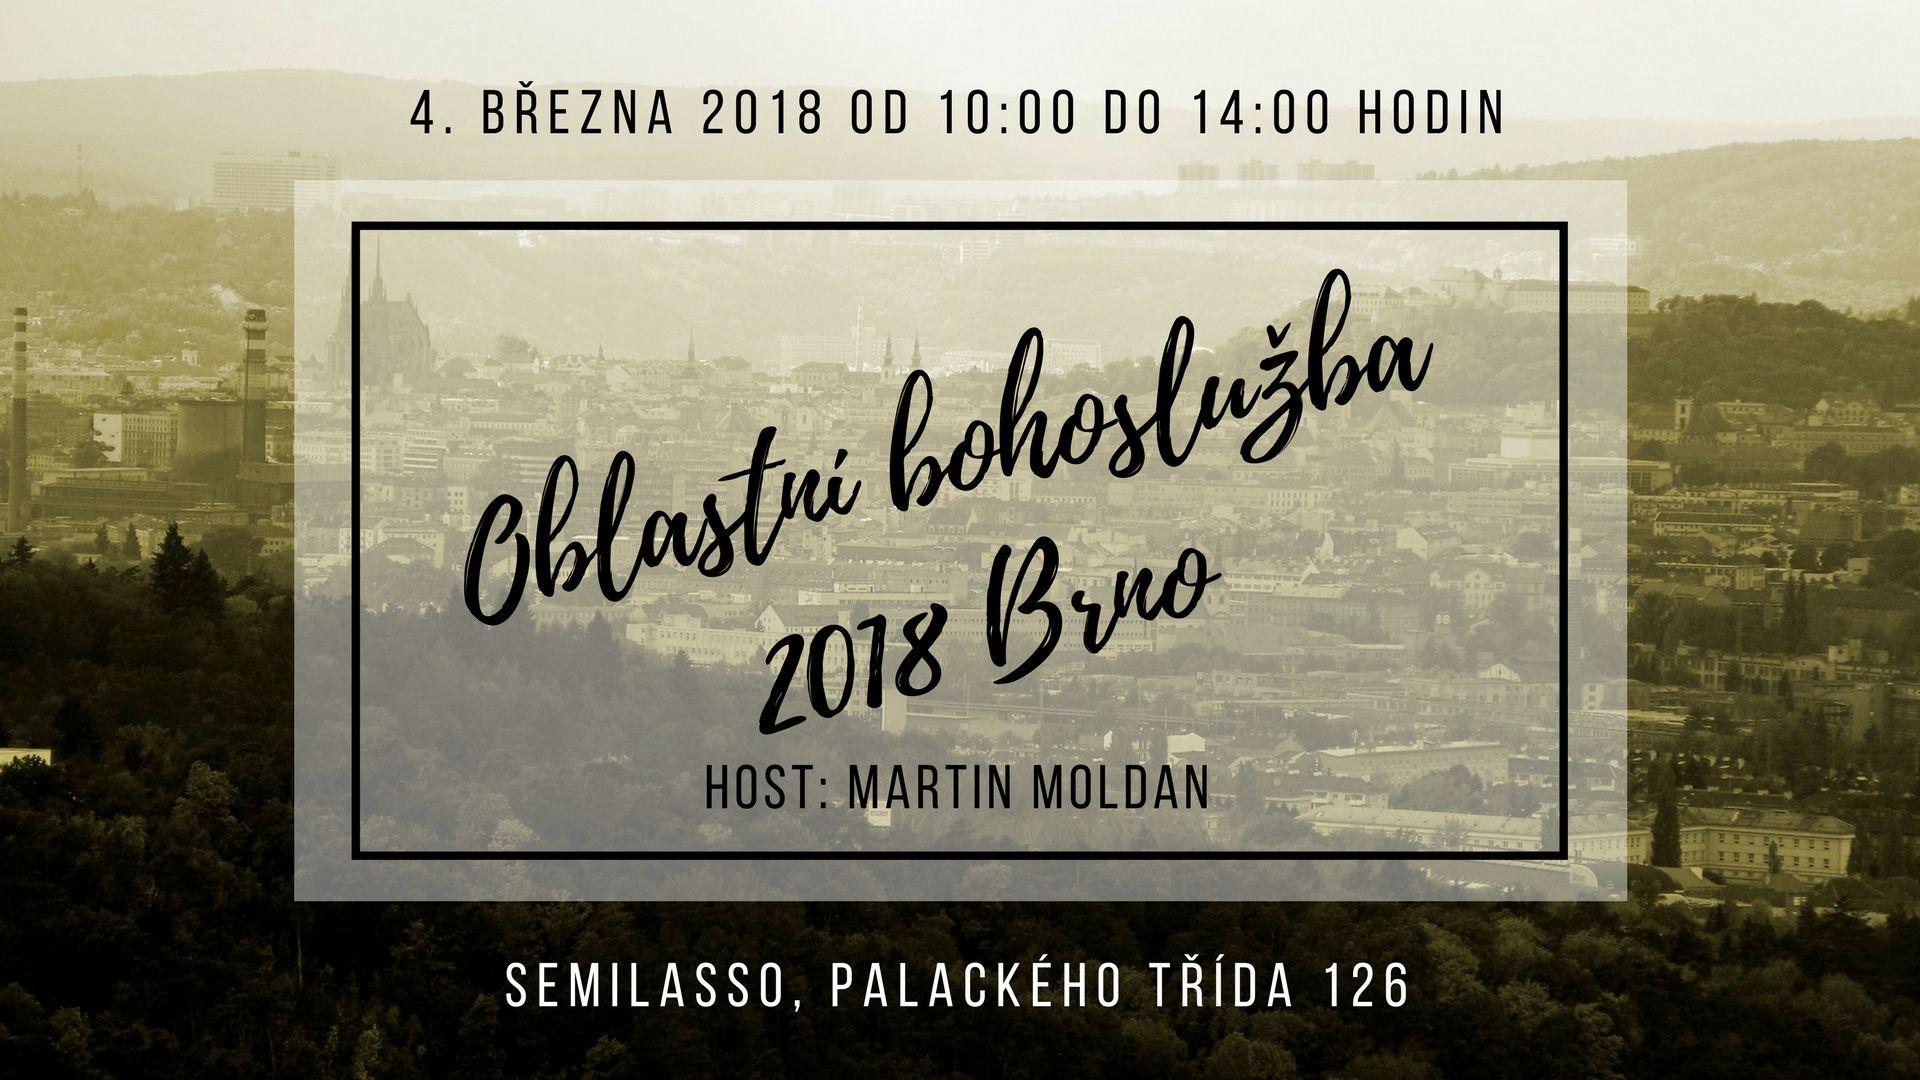 oblastni_bohosluzba_2018_brno_prezentace.jpg